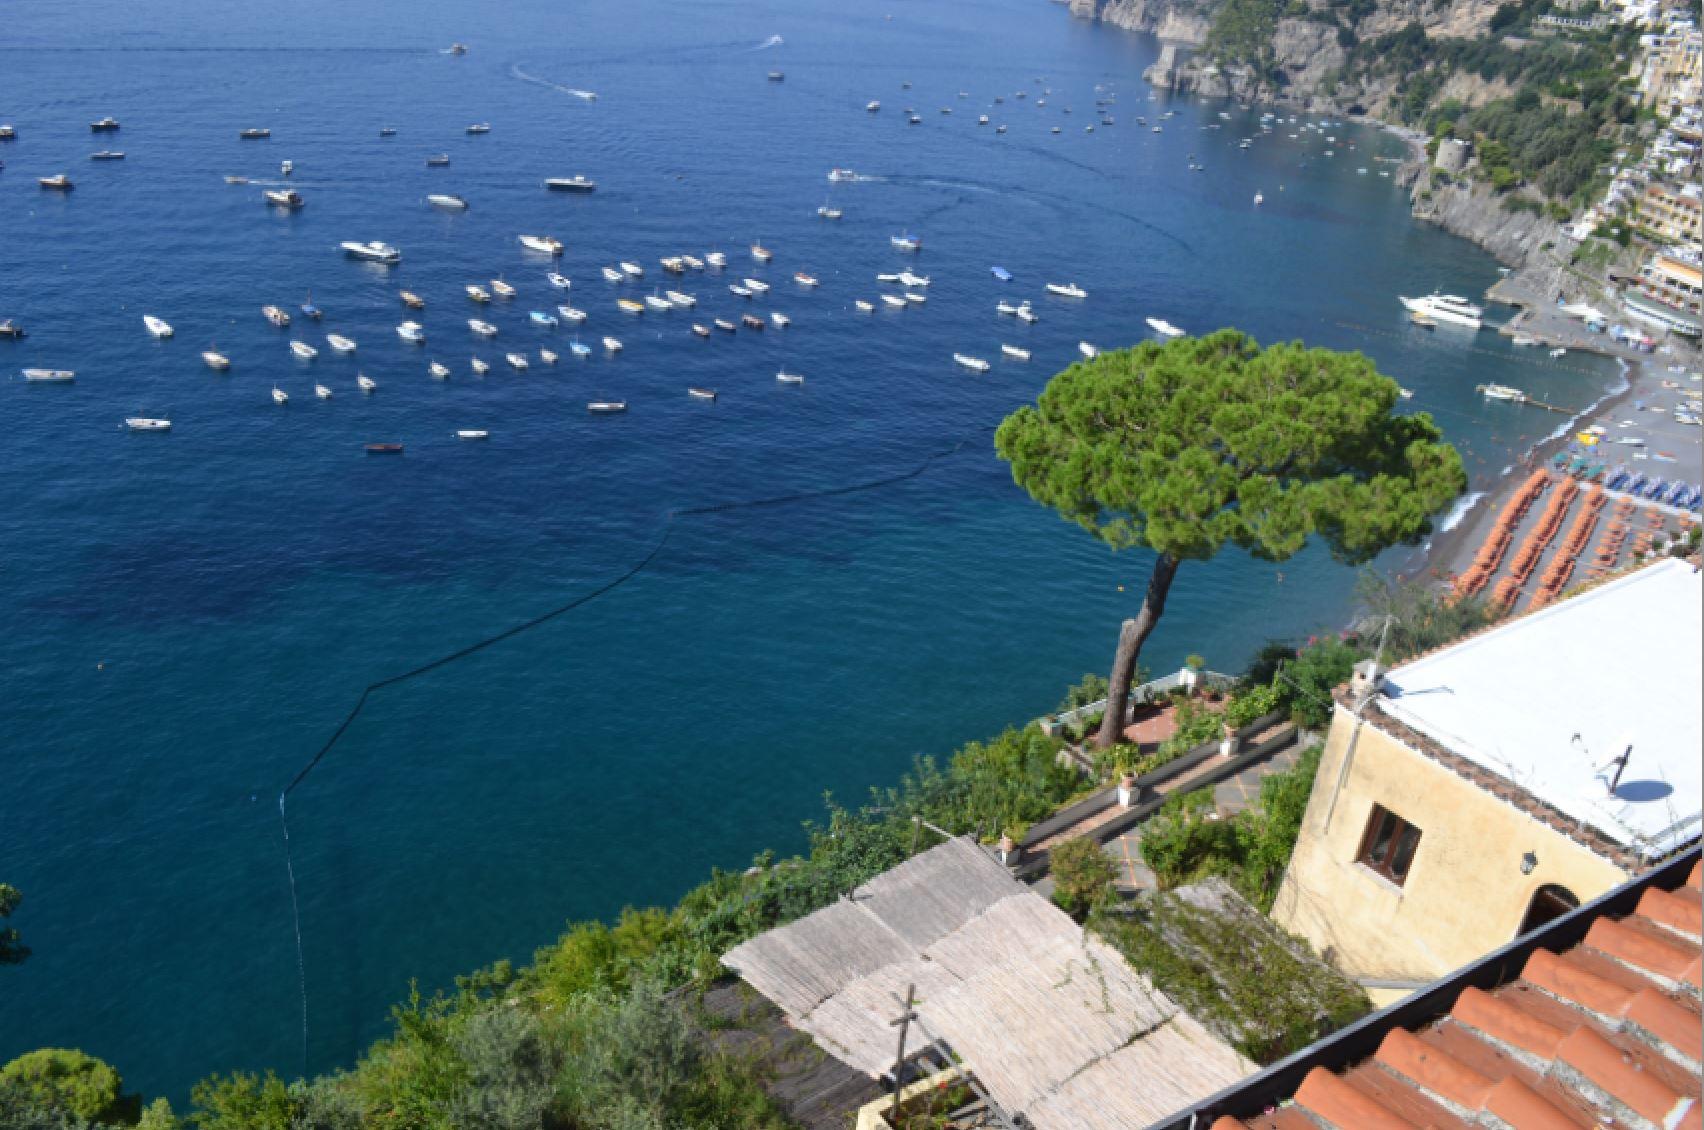 Amalfi Coast Positano boats